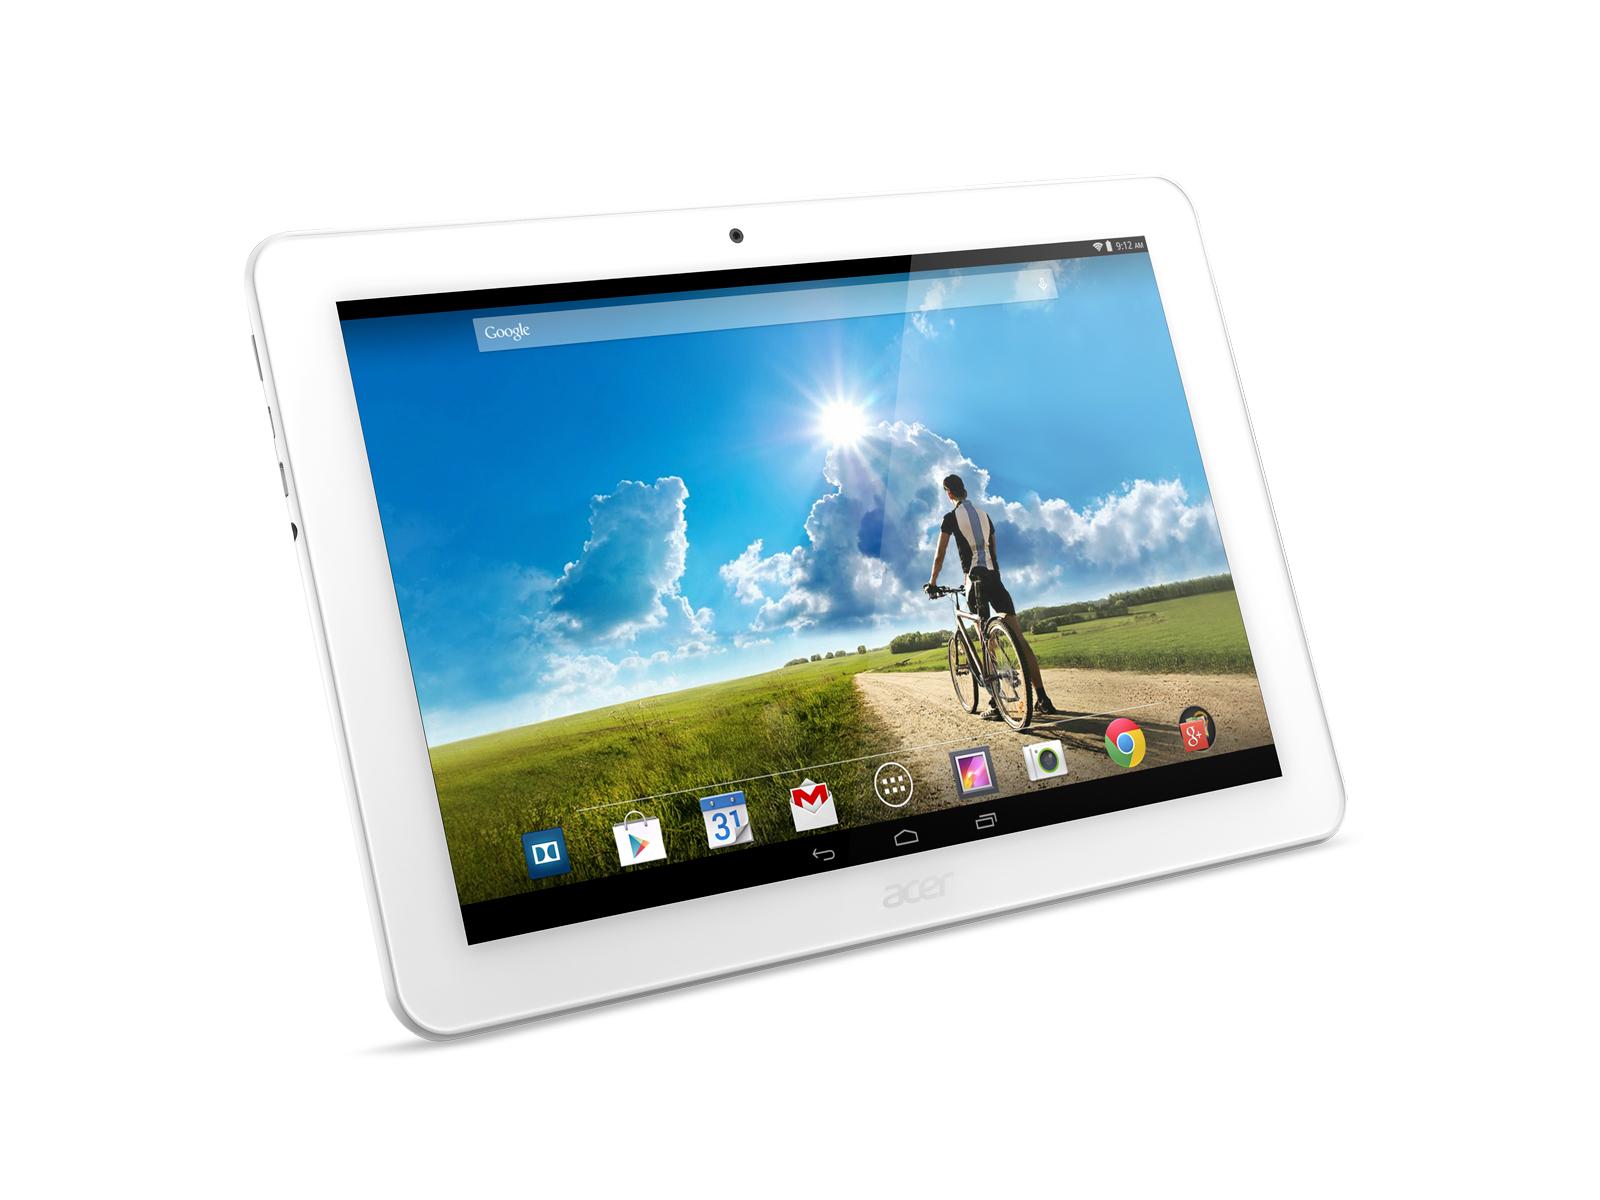 Acer Iconia Tab 10 A3-A20 táblagép teszt